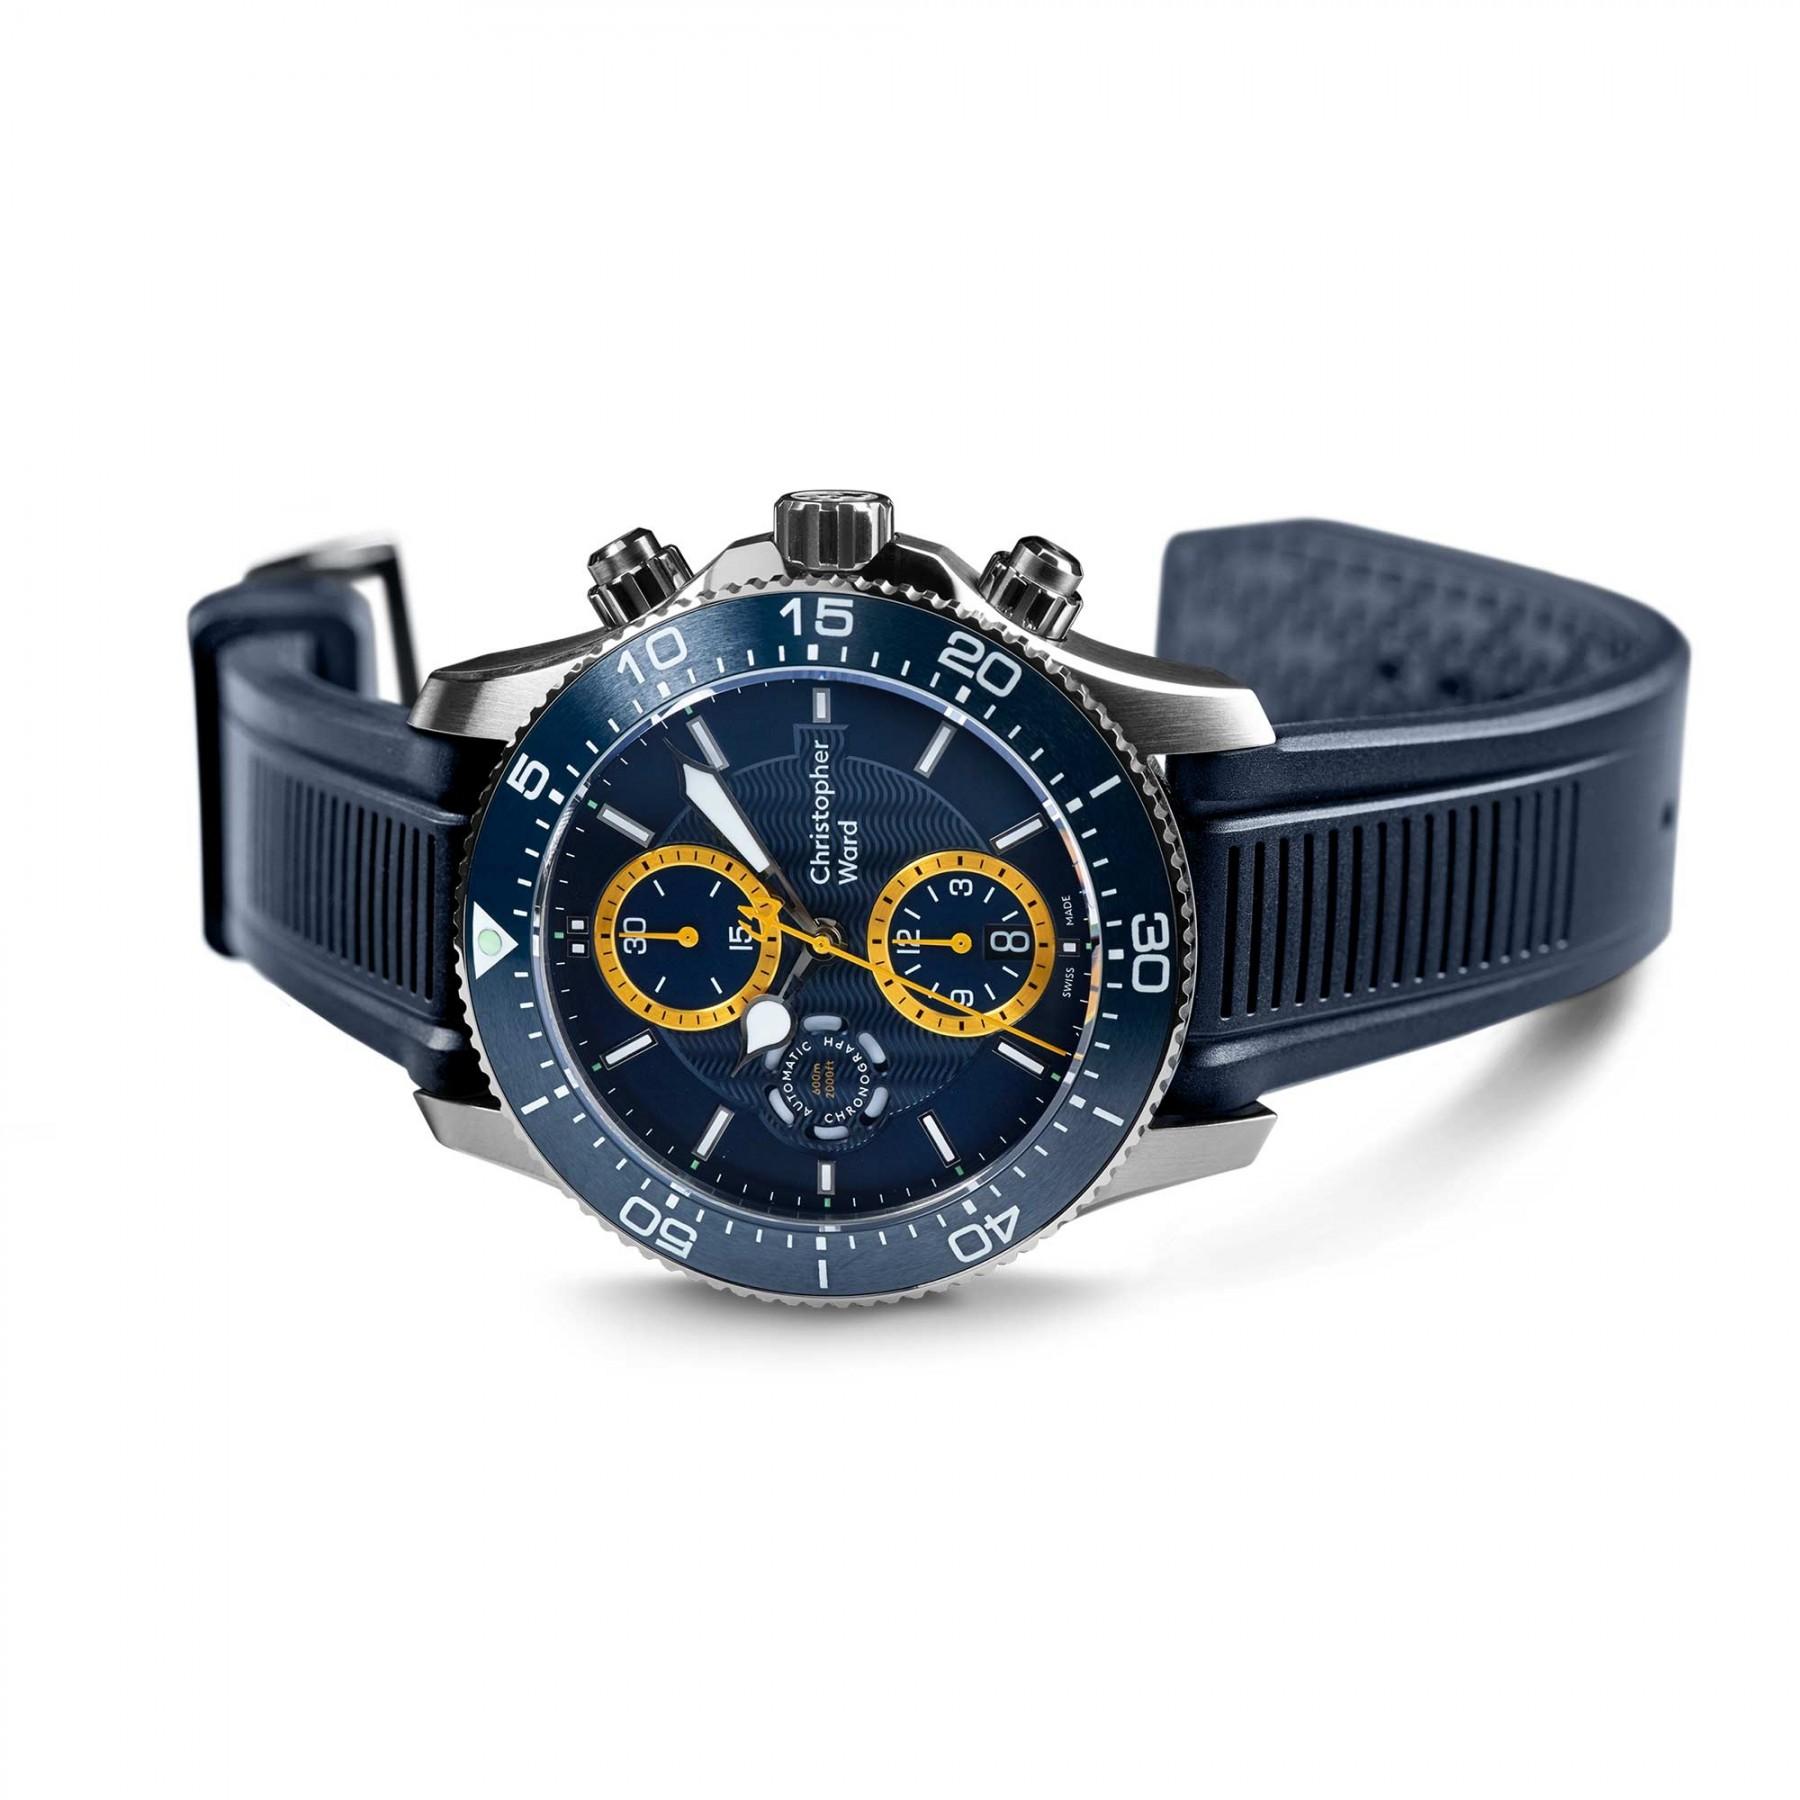 c60-trident-chronograph-pro-6001_2.jpg